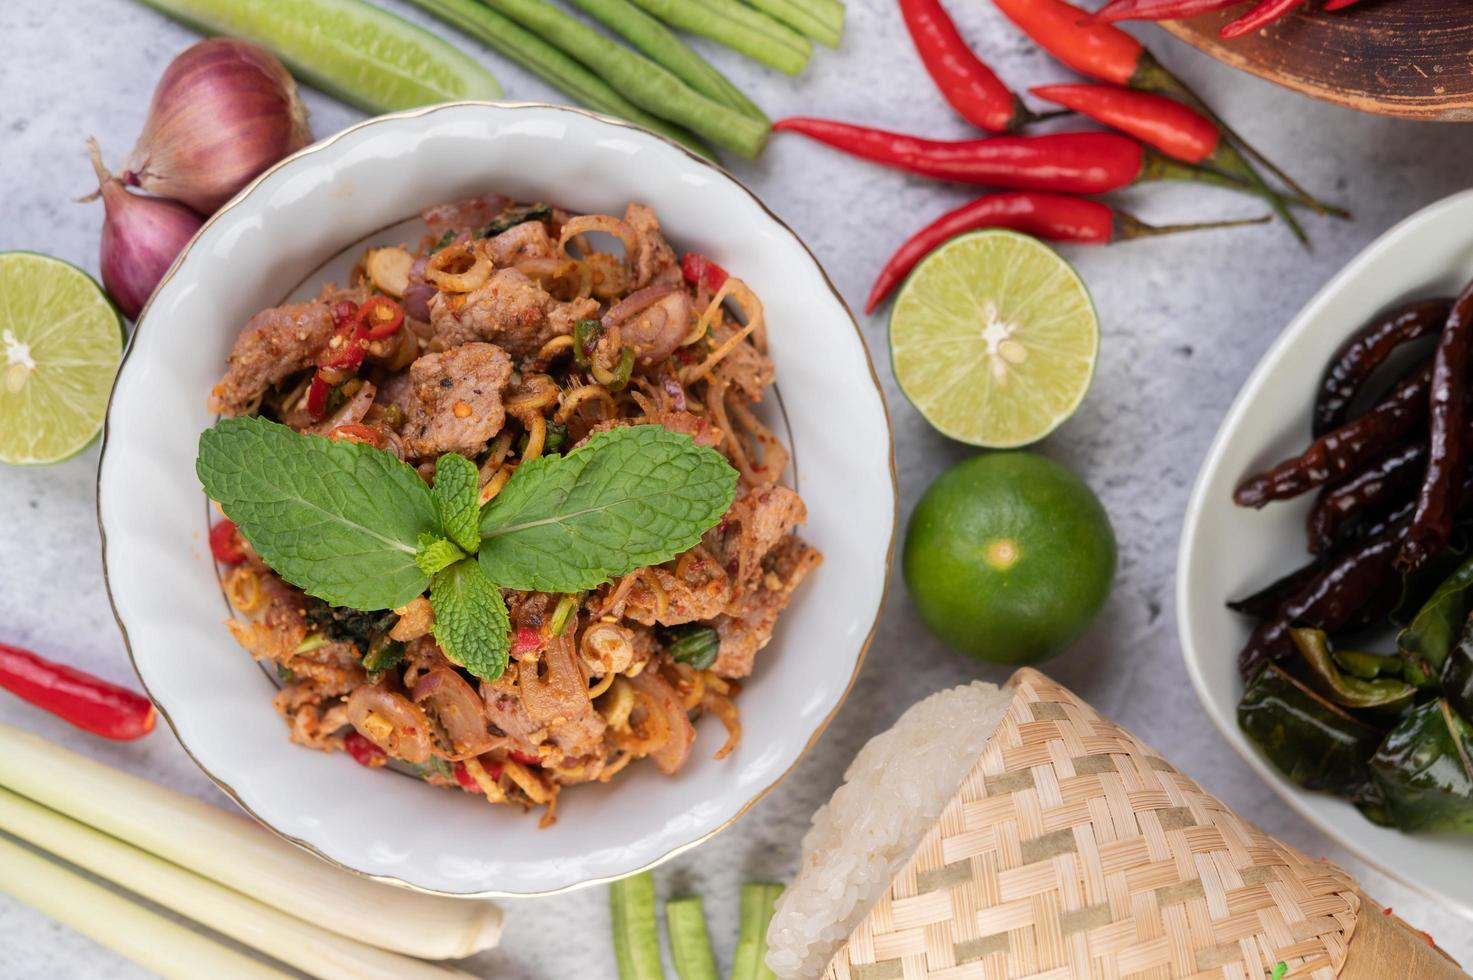 Spicy minced pork dish photo